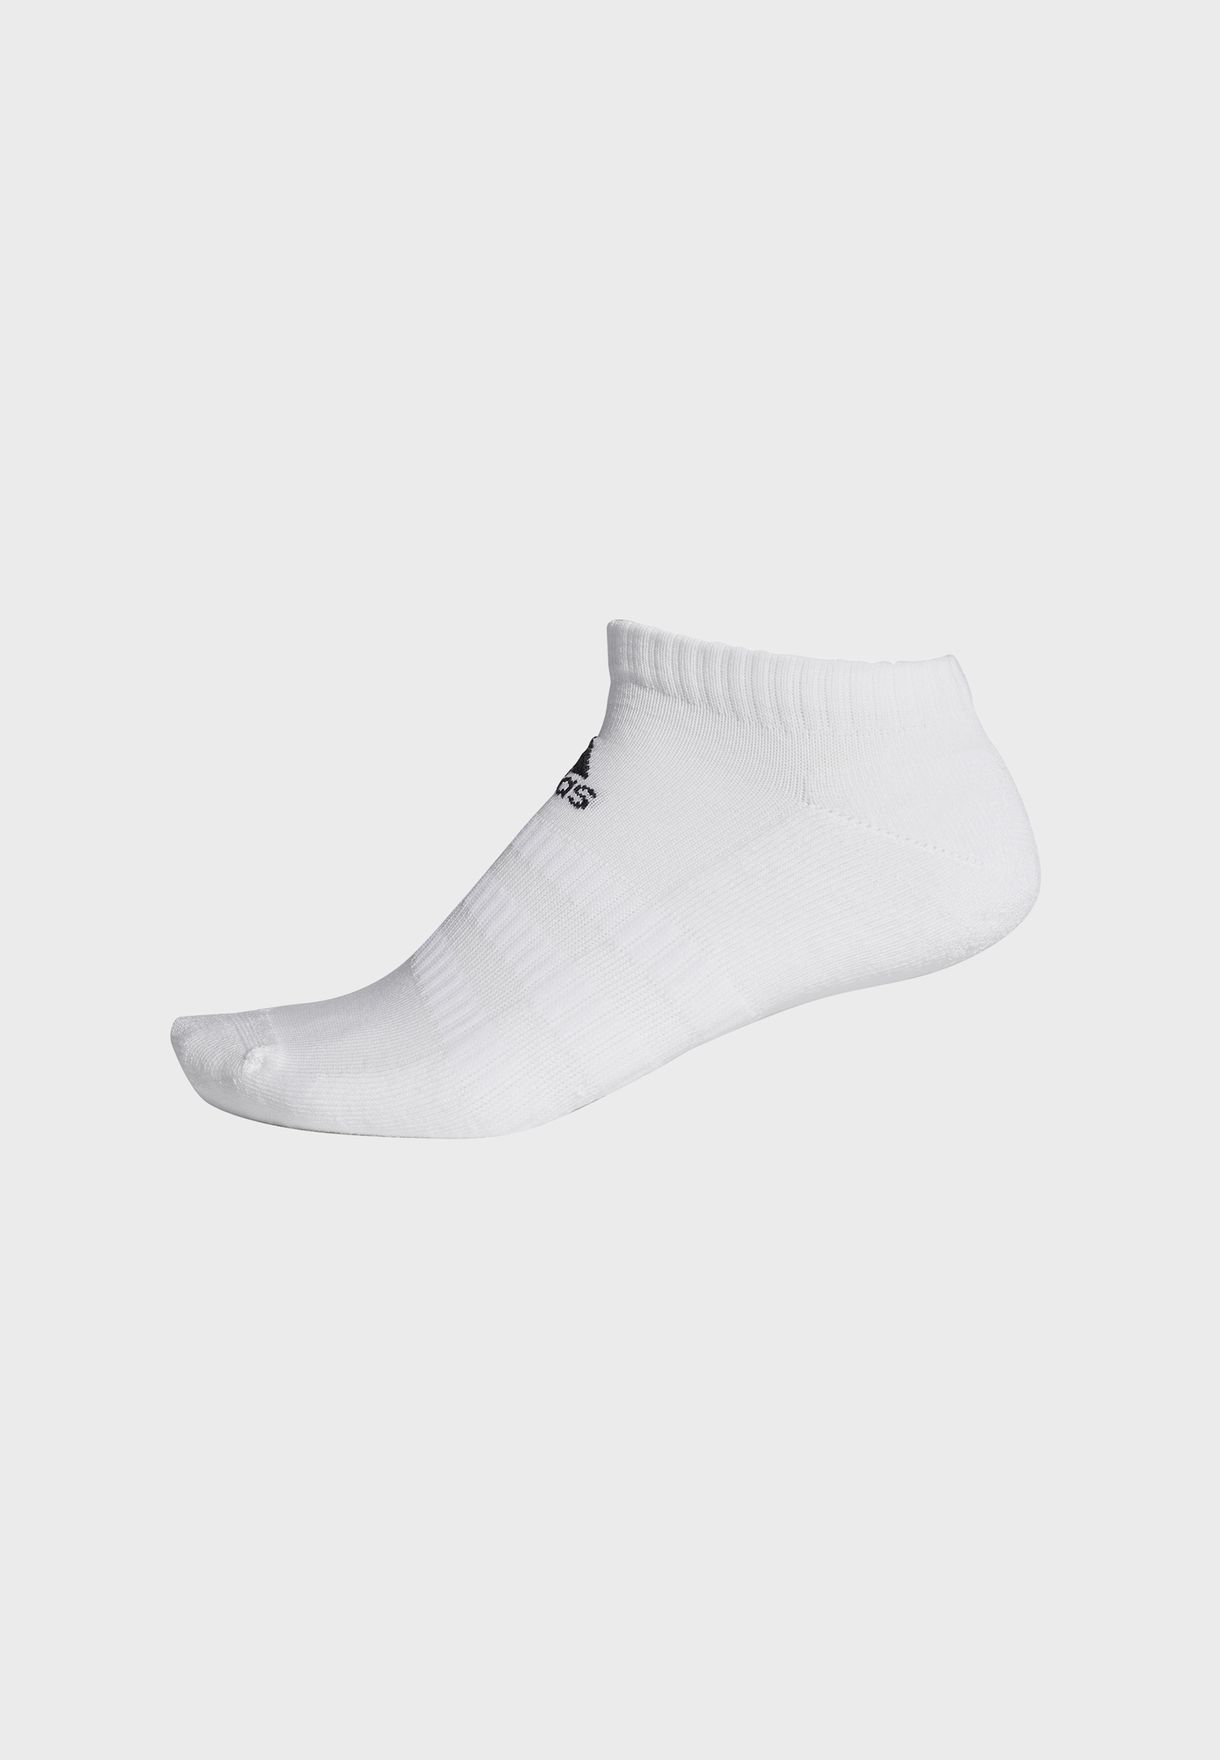 Cushion Low Cut Socks